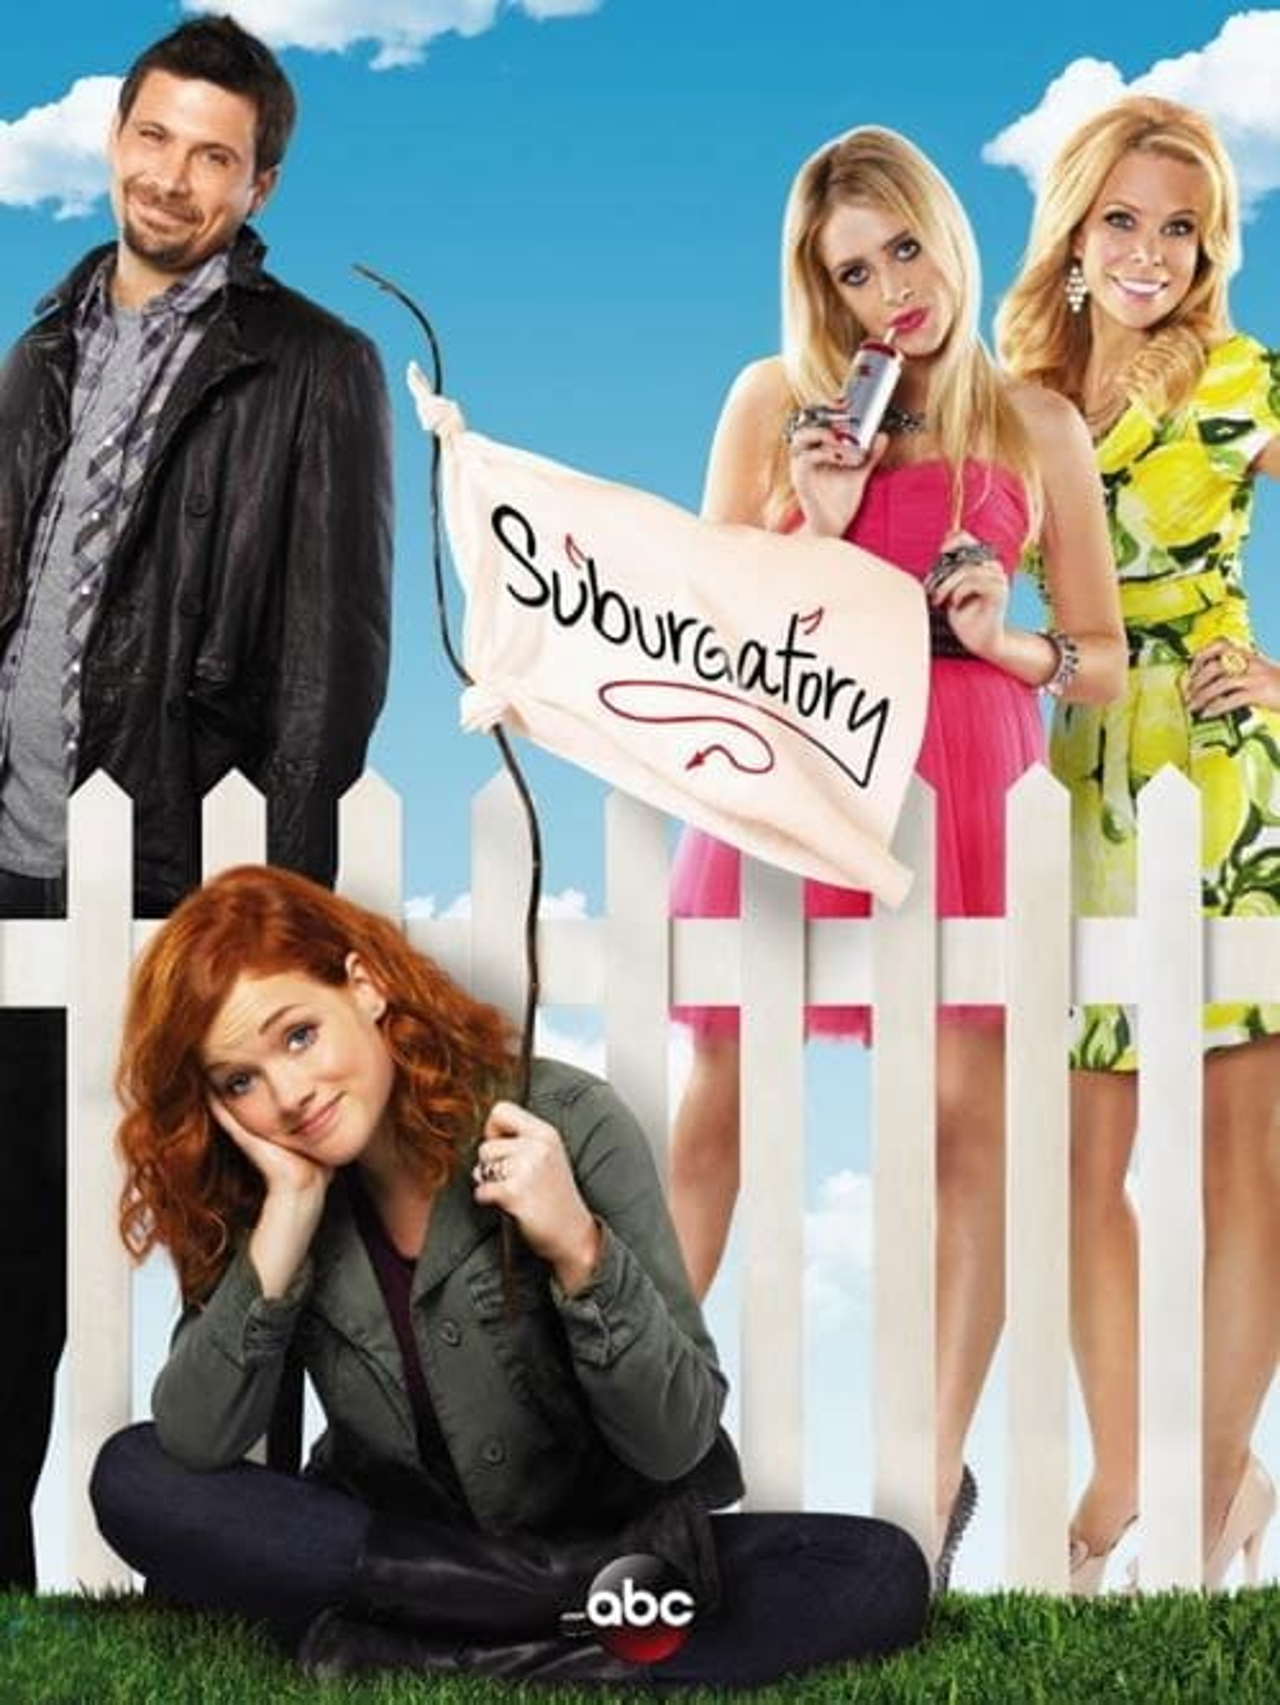 Suburgatory (Fuera de lugar) poster